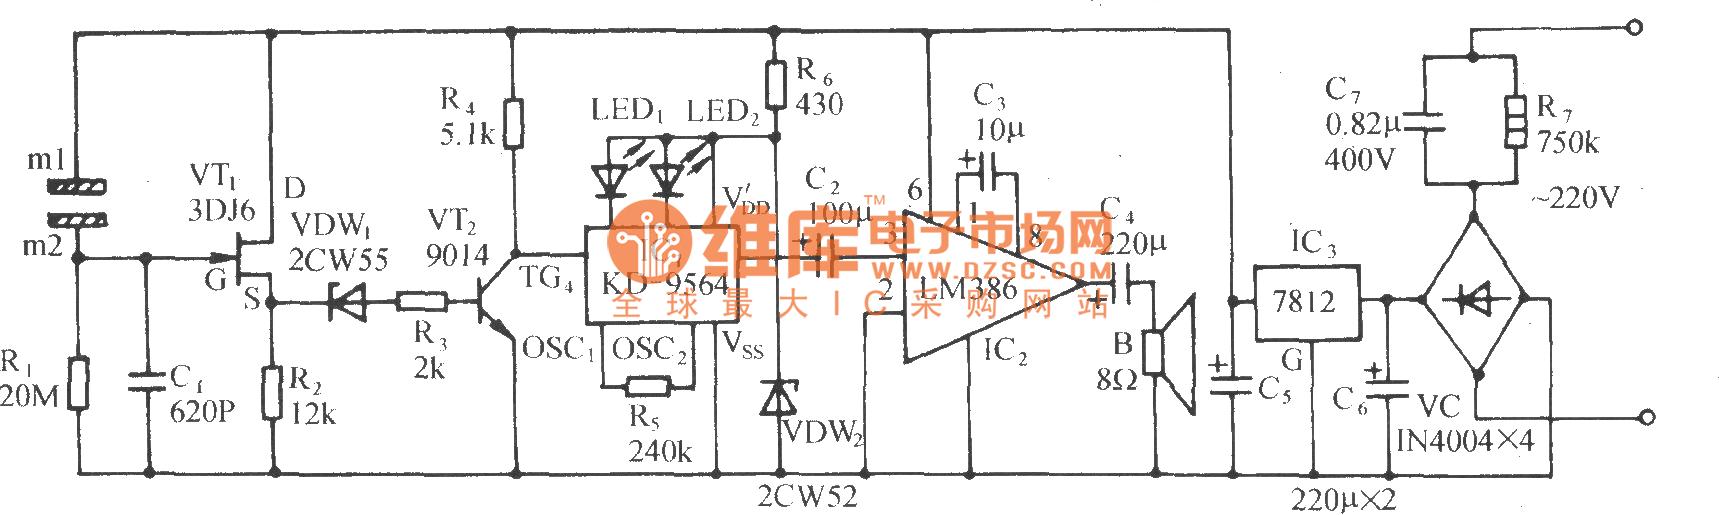 The Fire Alarm Circuit With Metal Plate As Fog Sensor Voltagecontrolledresistor Measuringandtestcircuit